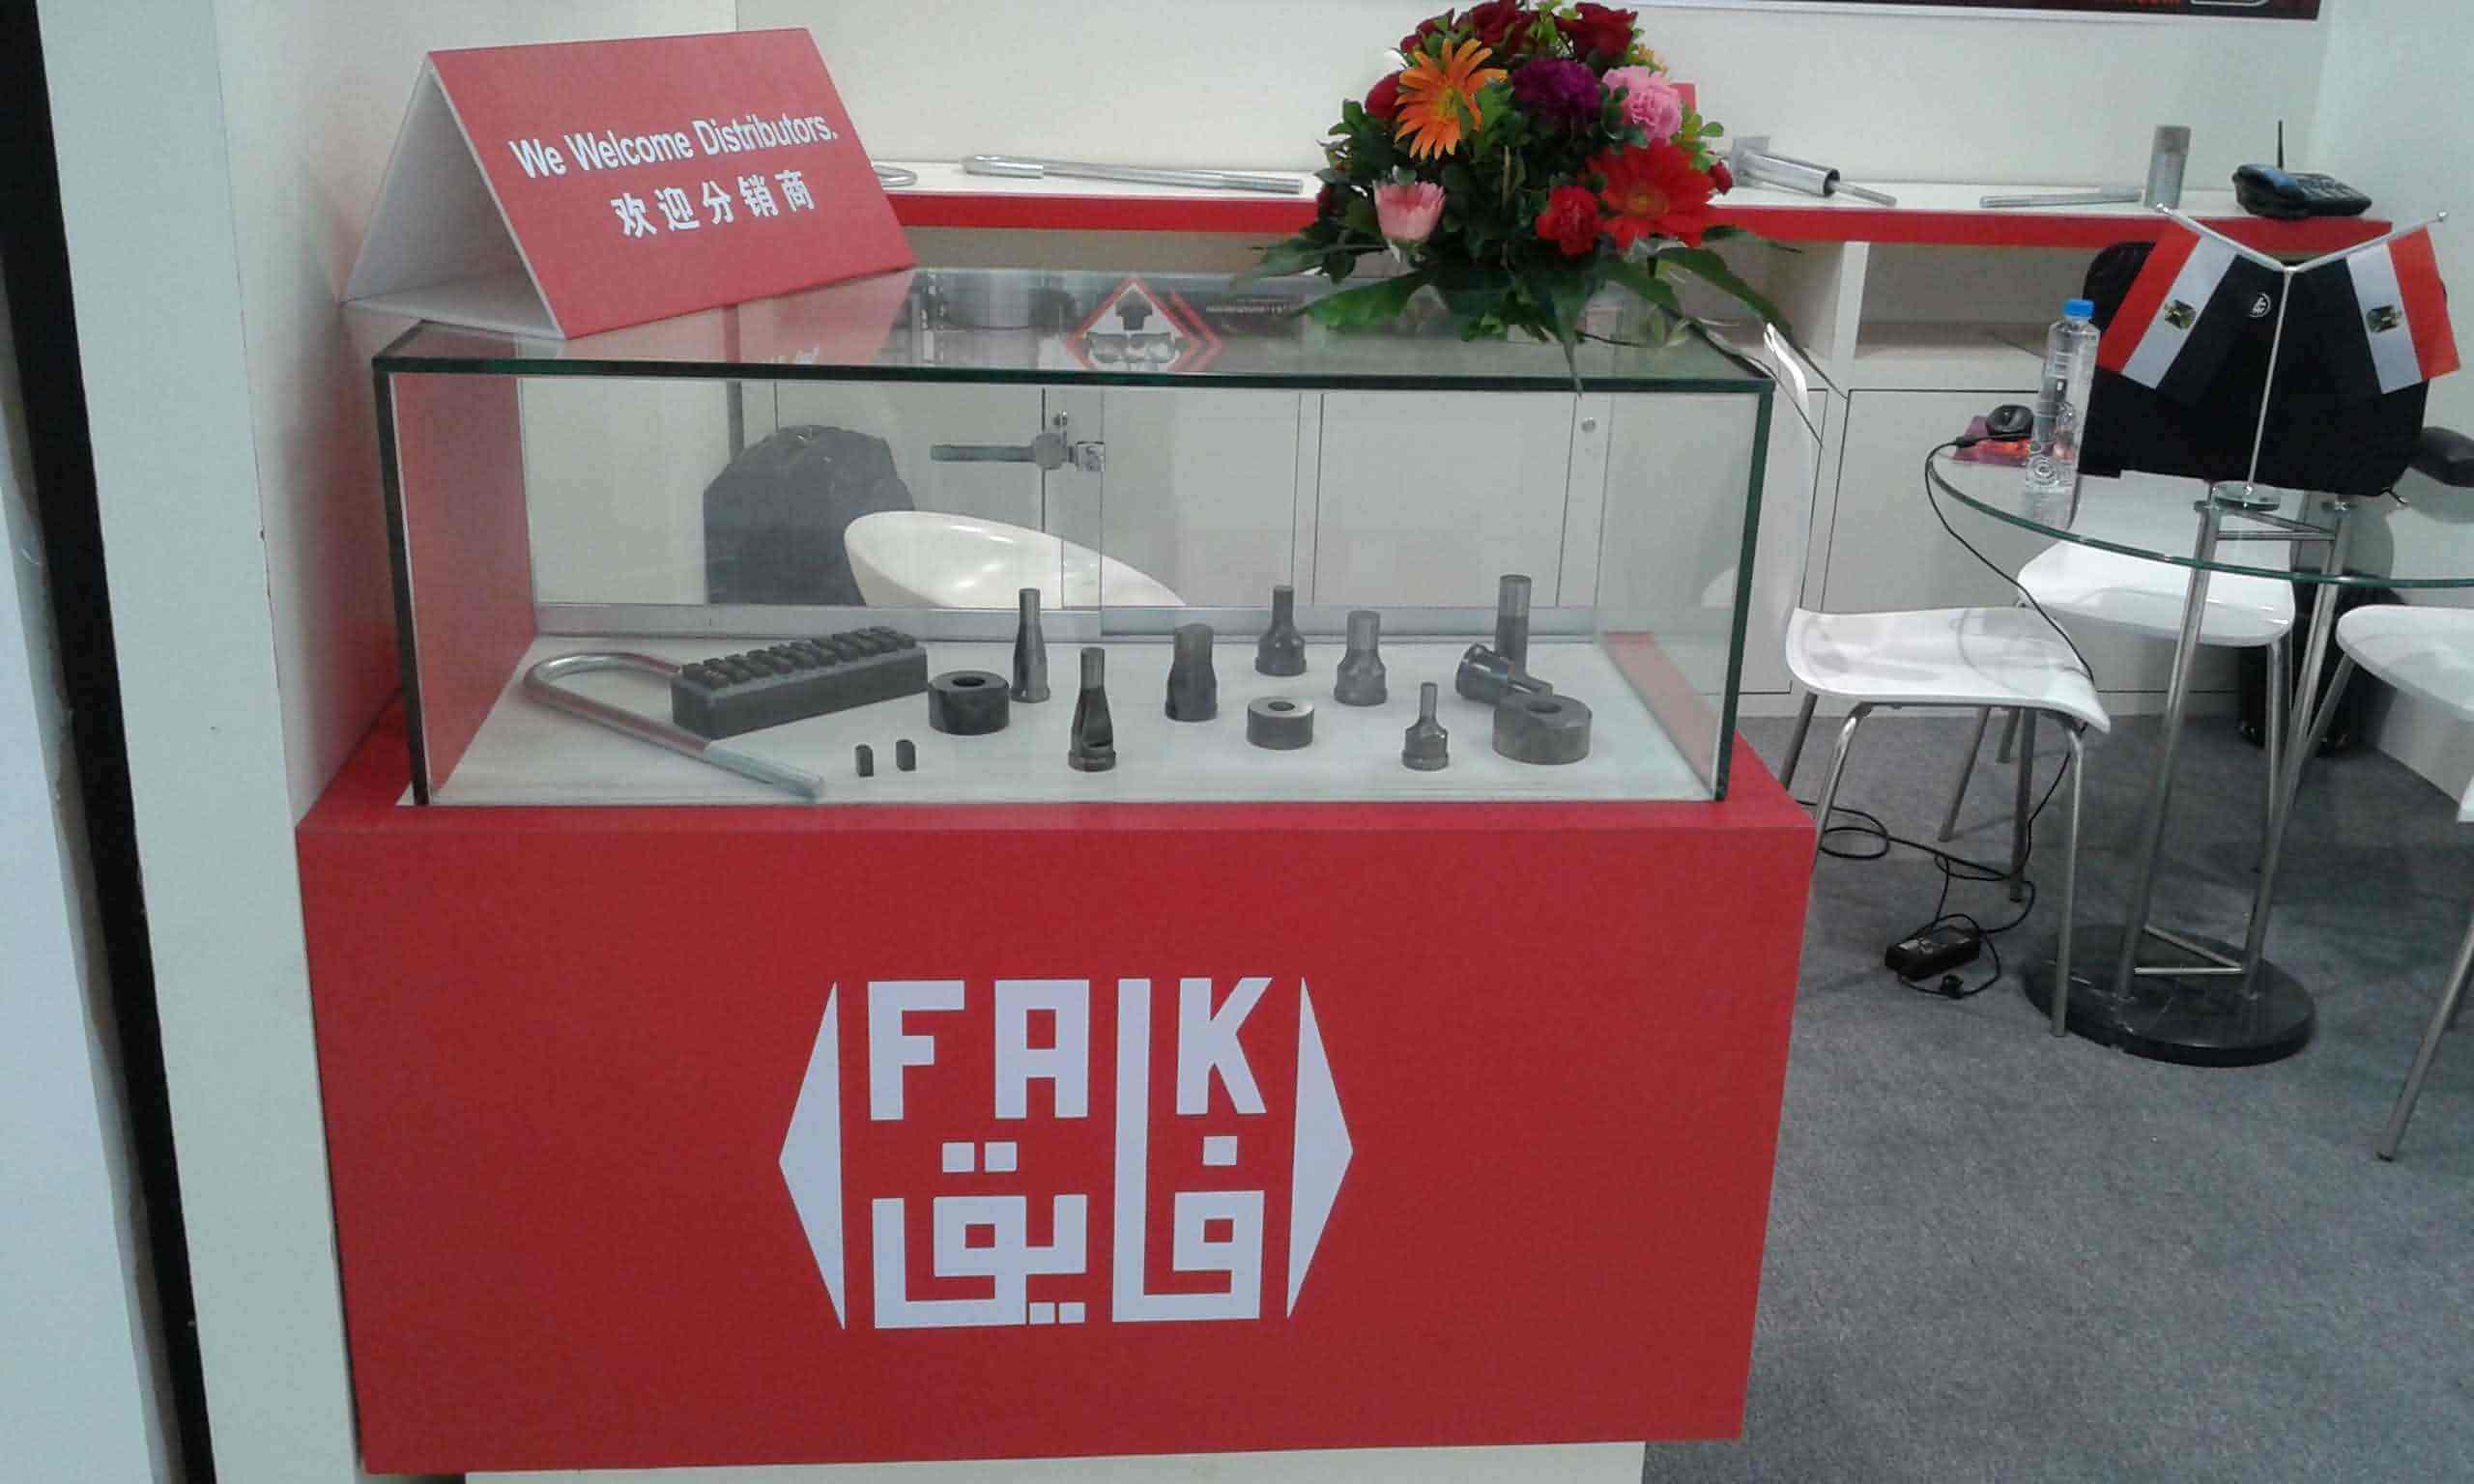 Faik Canton fair 114 -1